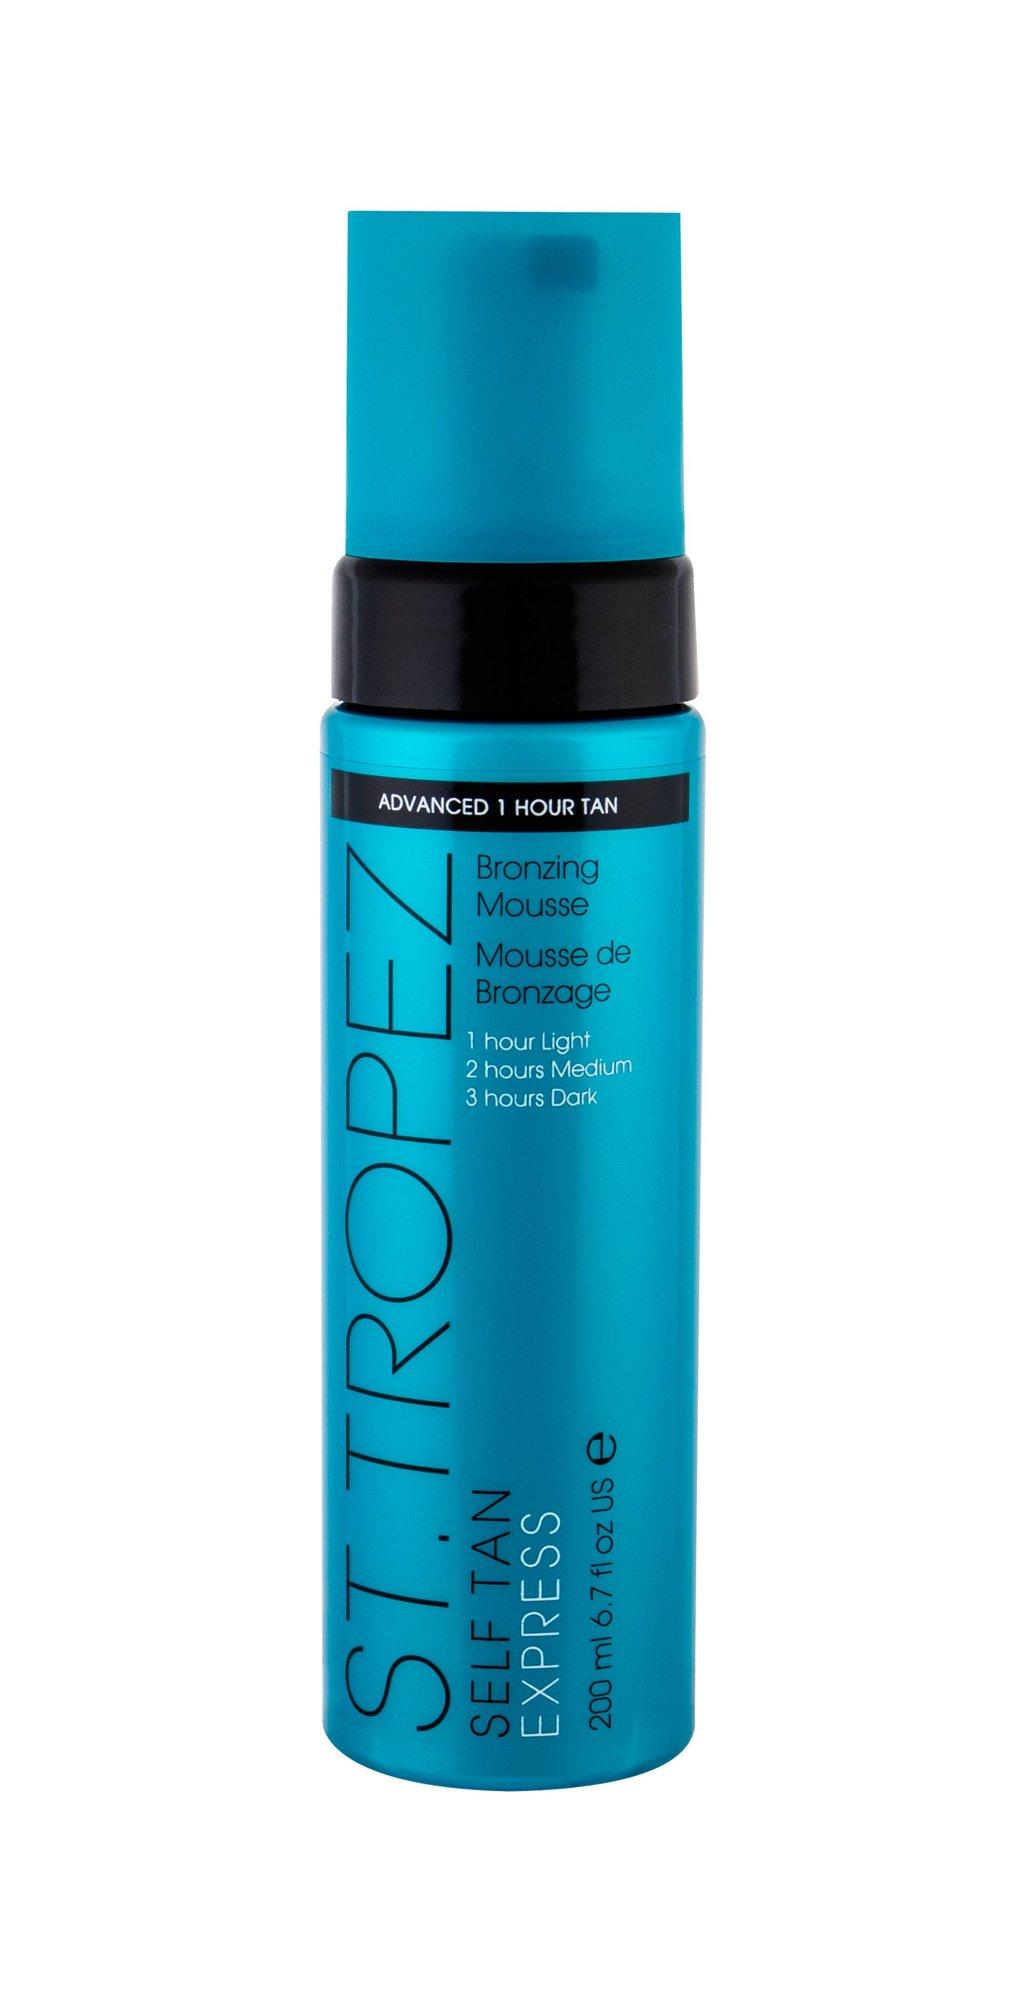 St.Tropez Self Tan Self Tanning Product 200ml  Express